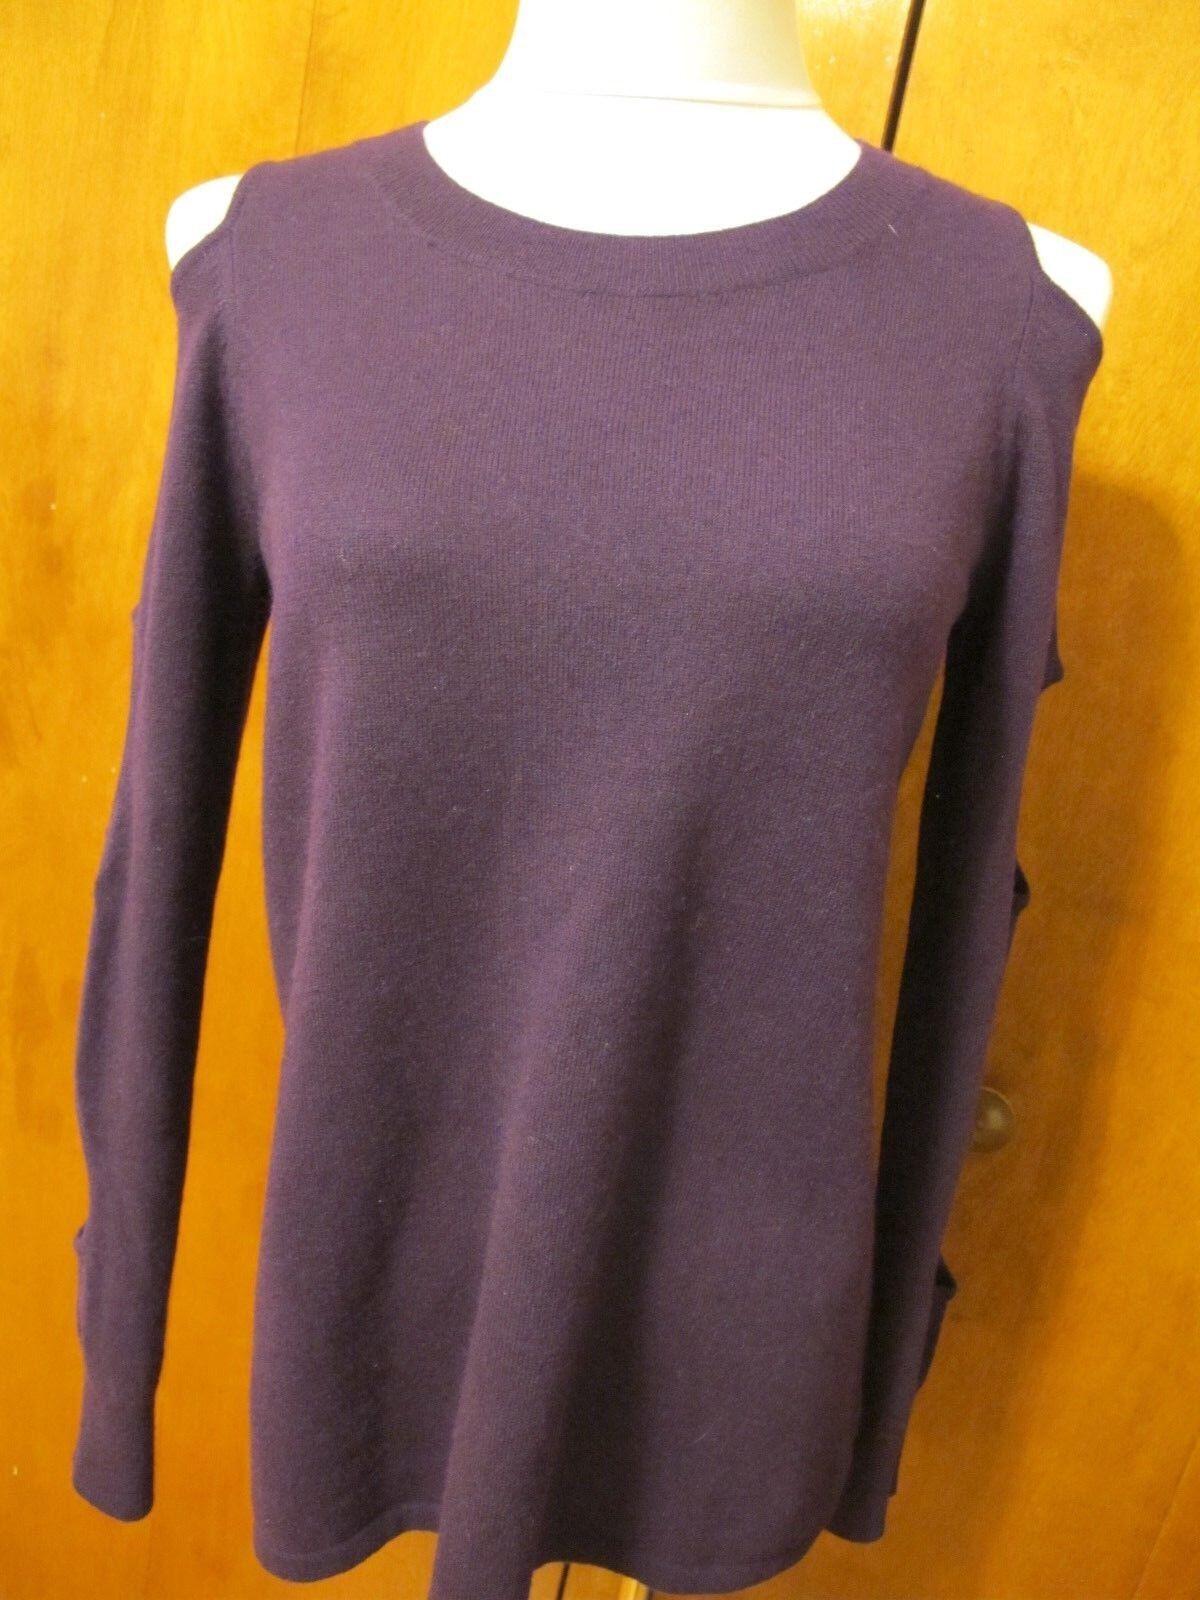 Aqua Women's Purple Amethyst Cashmere Soft Cold-Shoulder Sweater XS S NWT